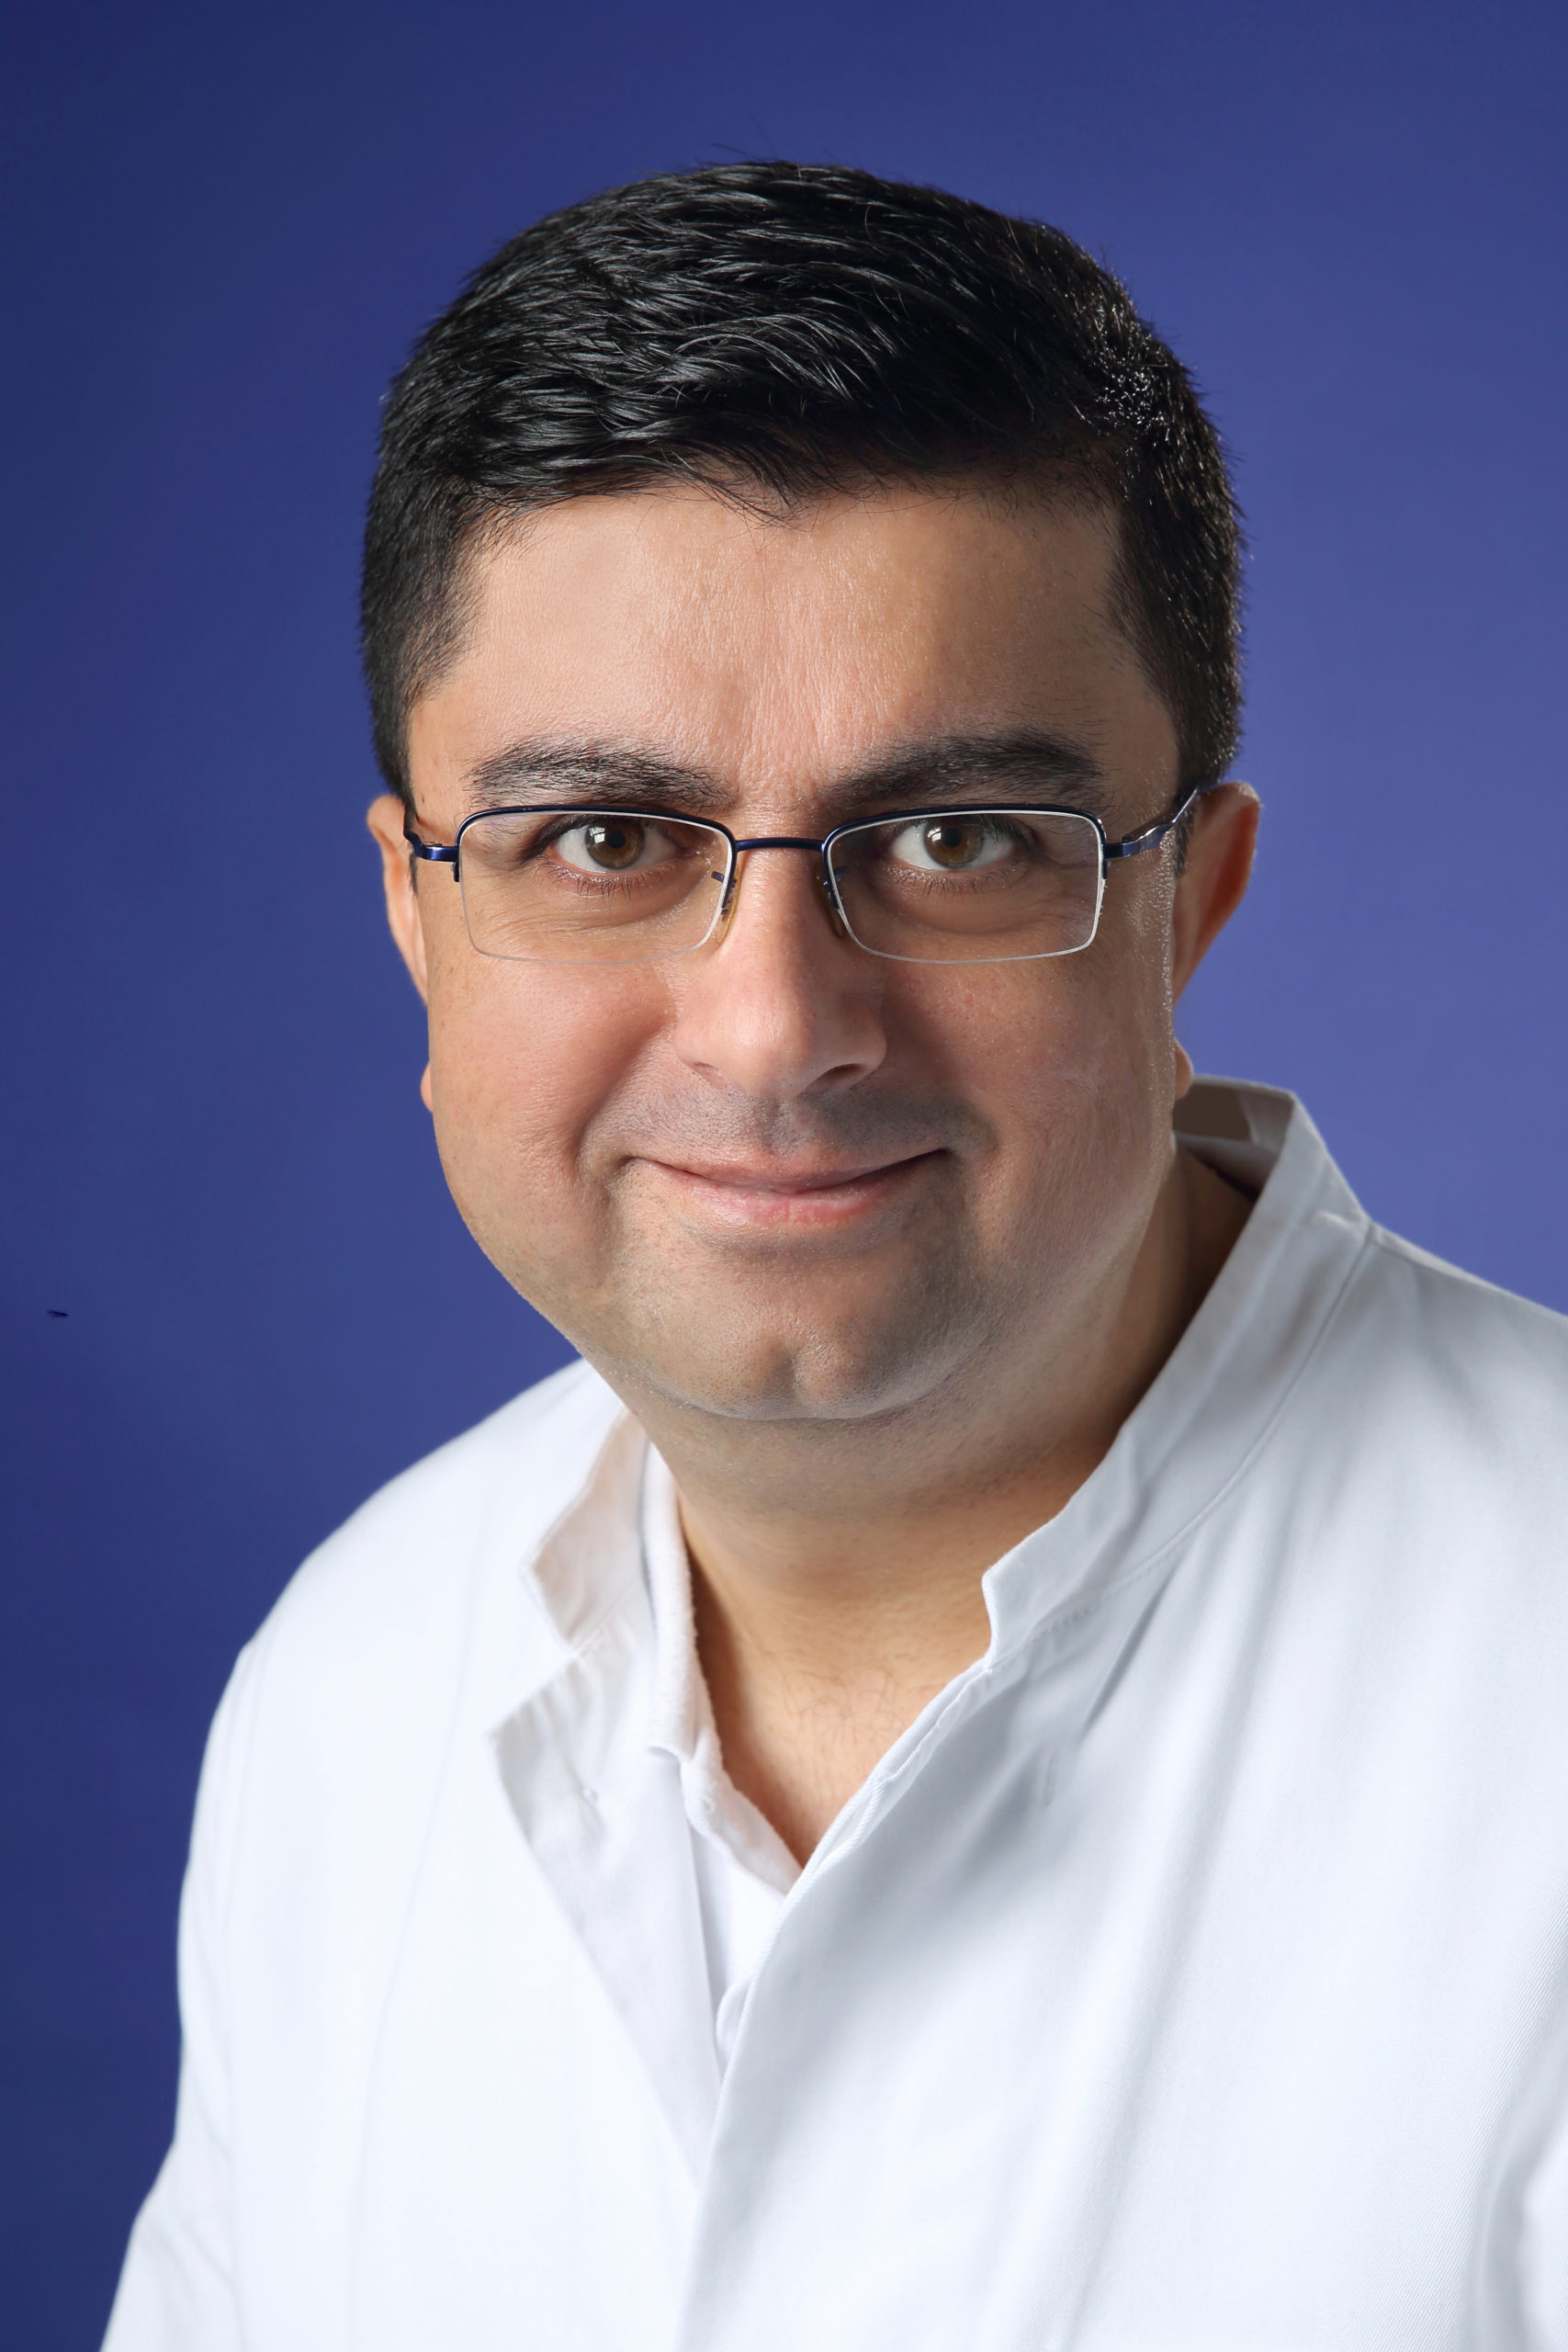 Zahnarztpraxis Dr. Fadi Ismail